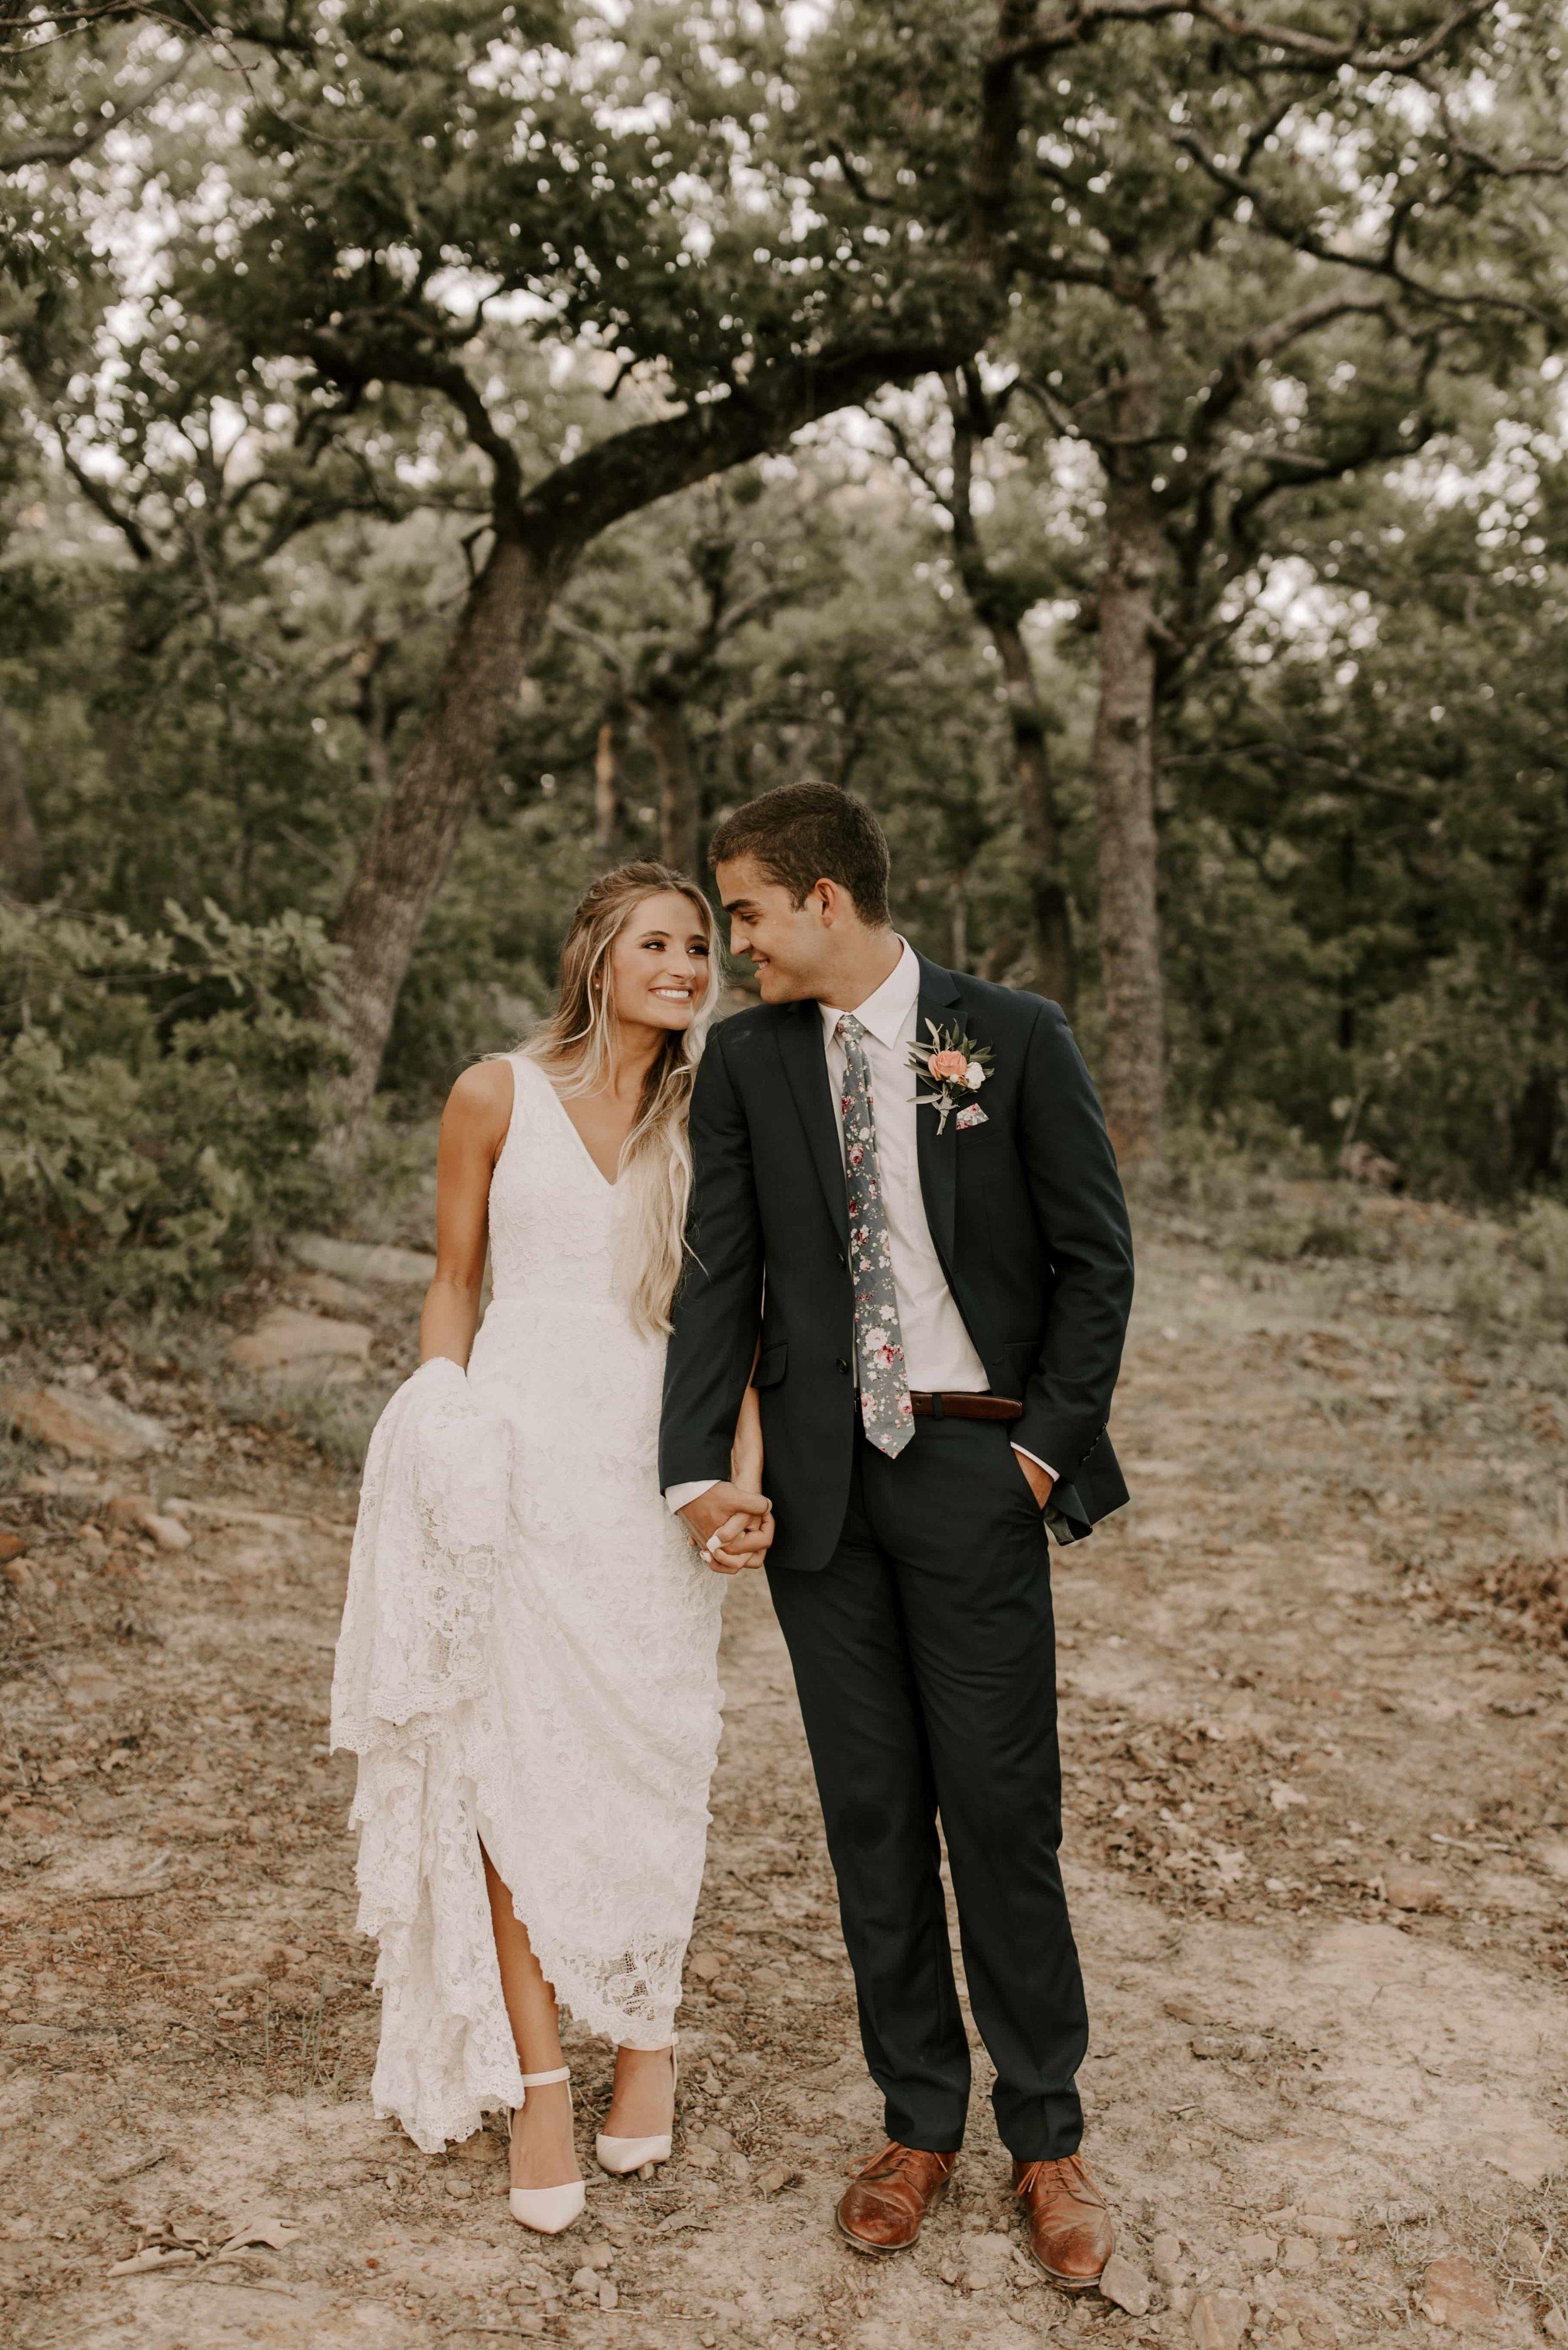 just married tulsa bixby wedding venue 3-min.jpg